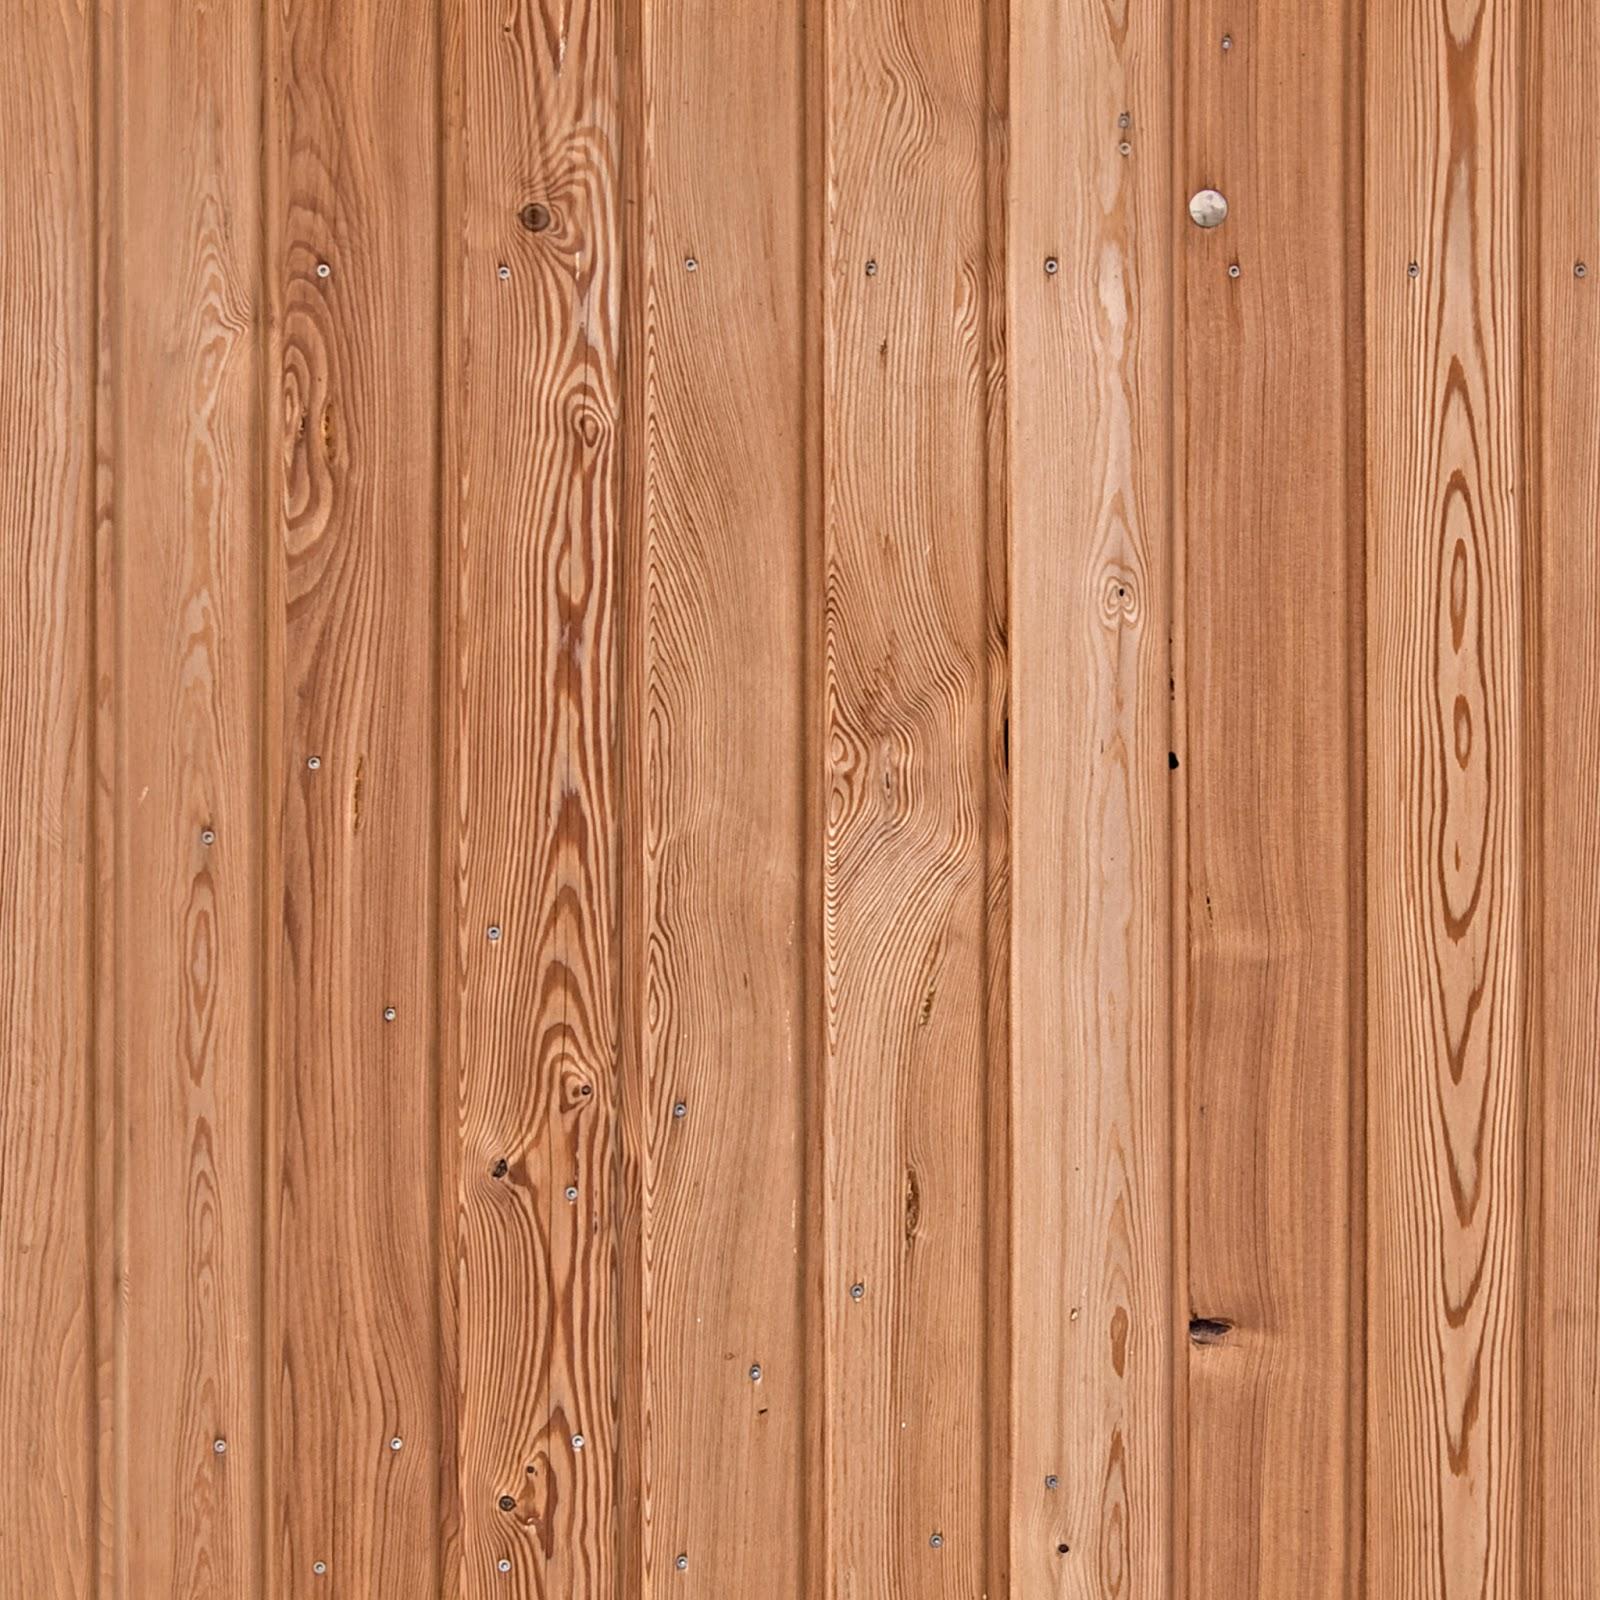 Editor audiovisuals el templat textura madera seamless - Duelas de madera ...